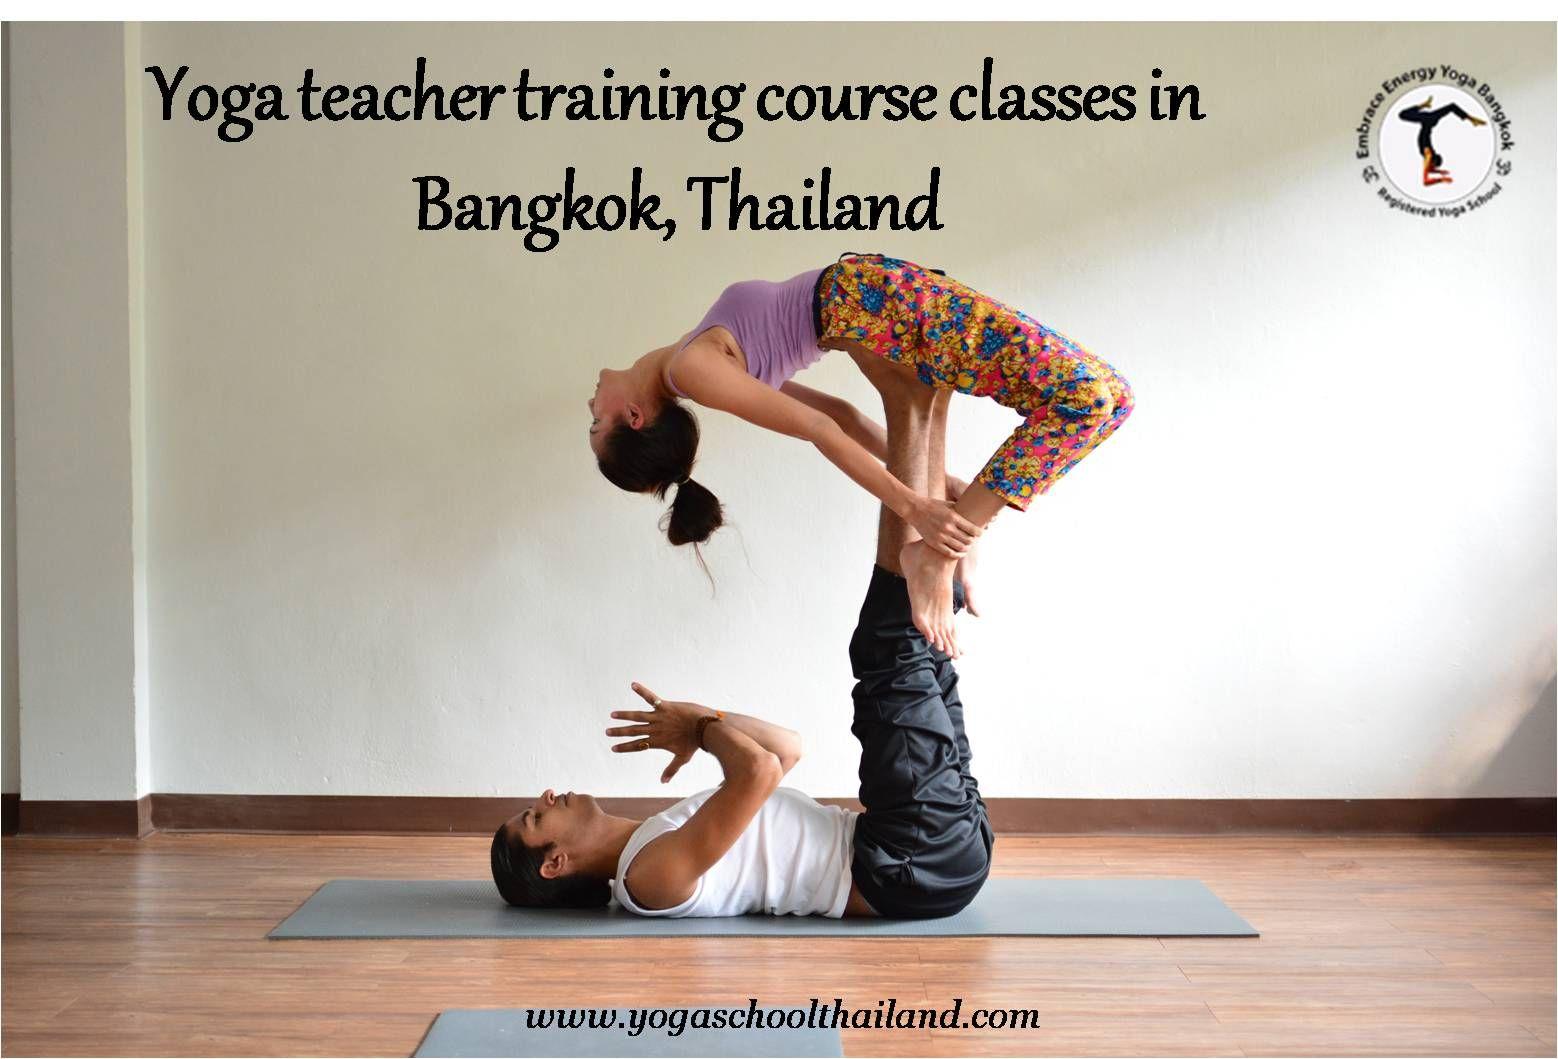 300 Hours Yoga Ttc Teacher Training In Bangkok Join 300 Hours Yoga Ttc Certified By Yoga Alliance Usa And F Yoga Teacher Training Teacher Training Yoga Courses